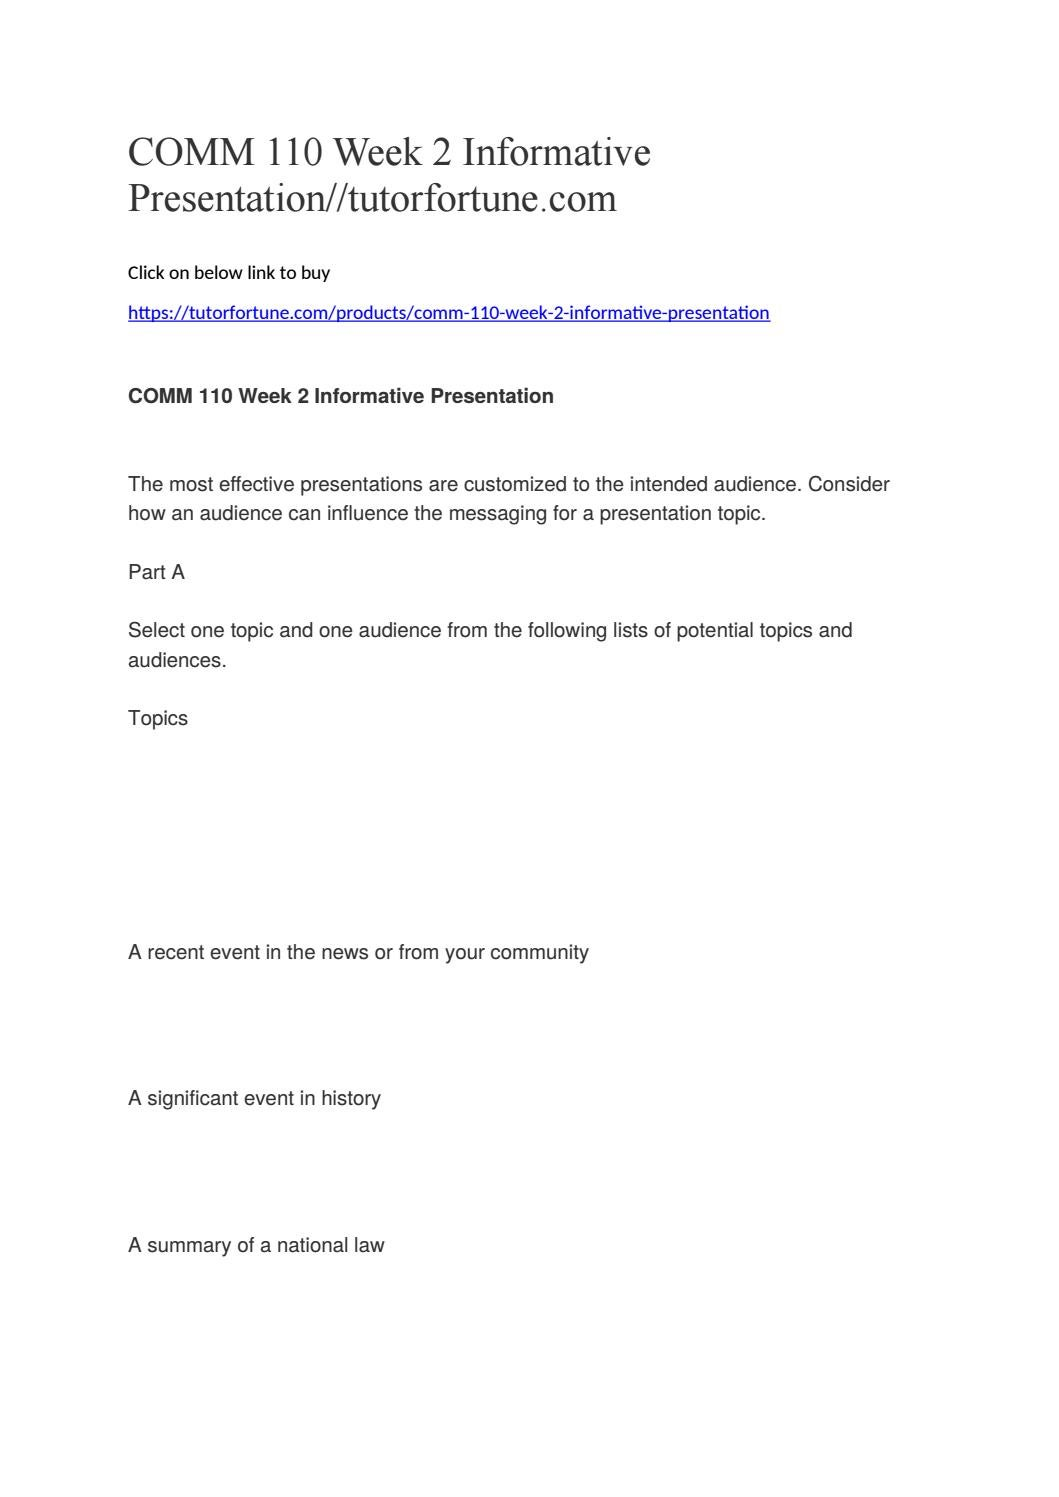 COMM 110 Week 2 Informative Presentation//tutorfortune com